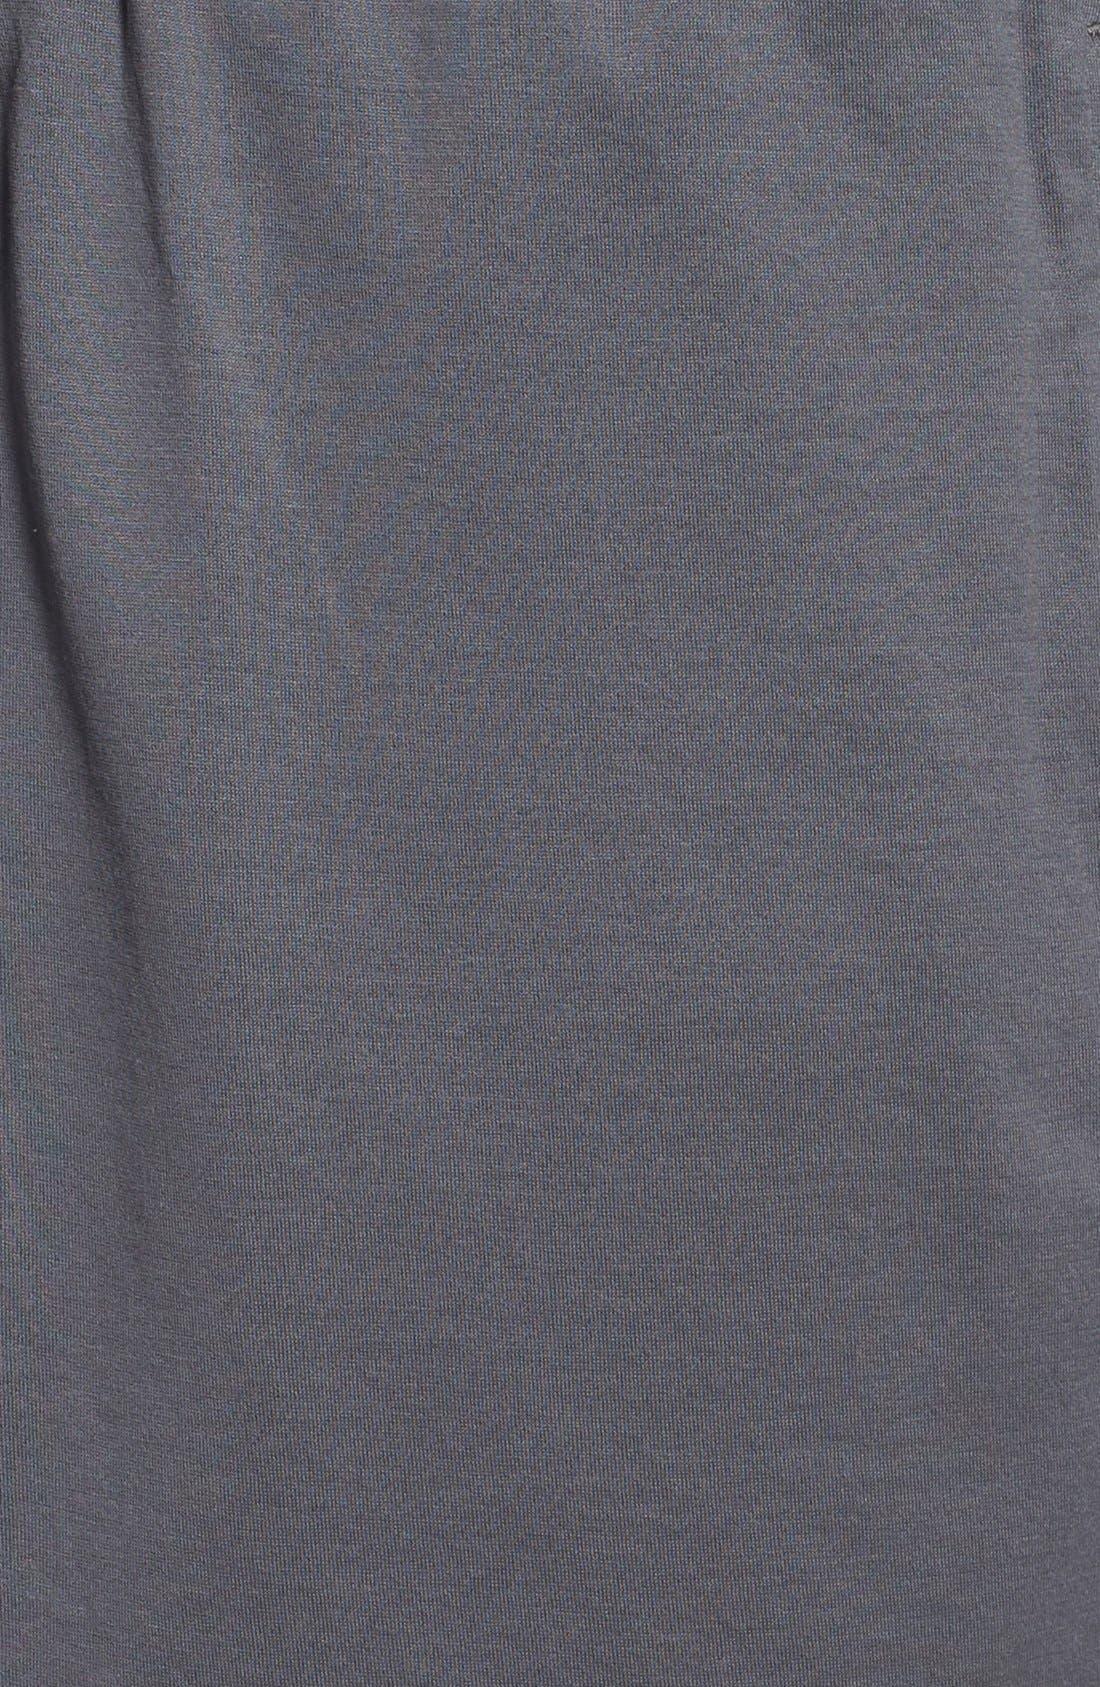 'Down Time' Knit Lounge Shorts,                             Alternate thumbnail 3, color,